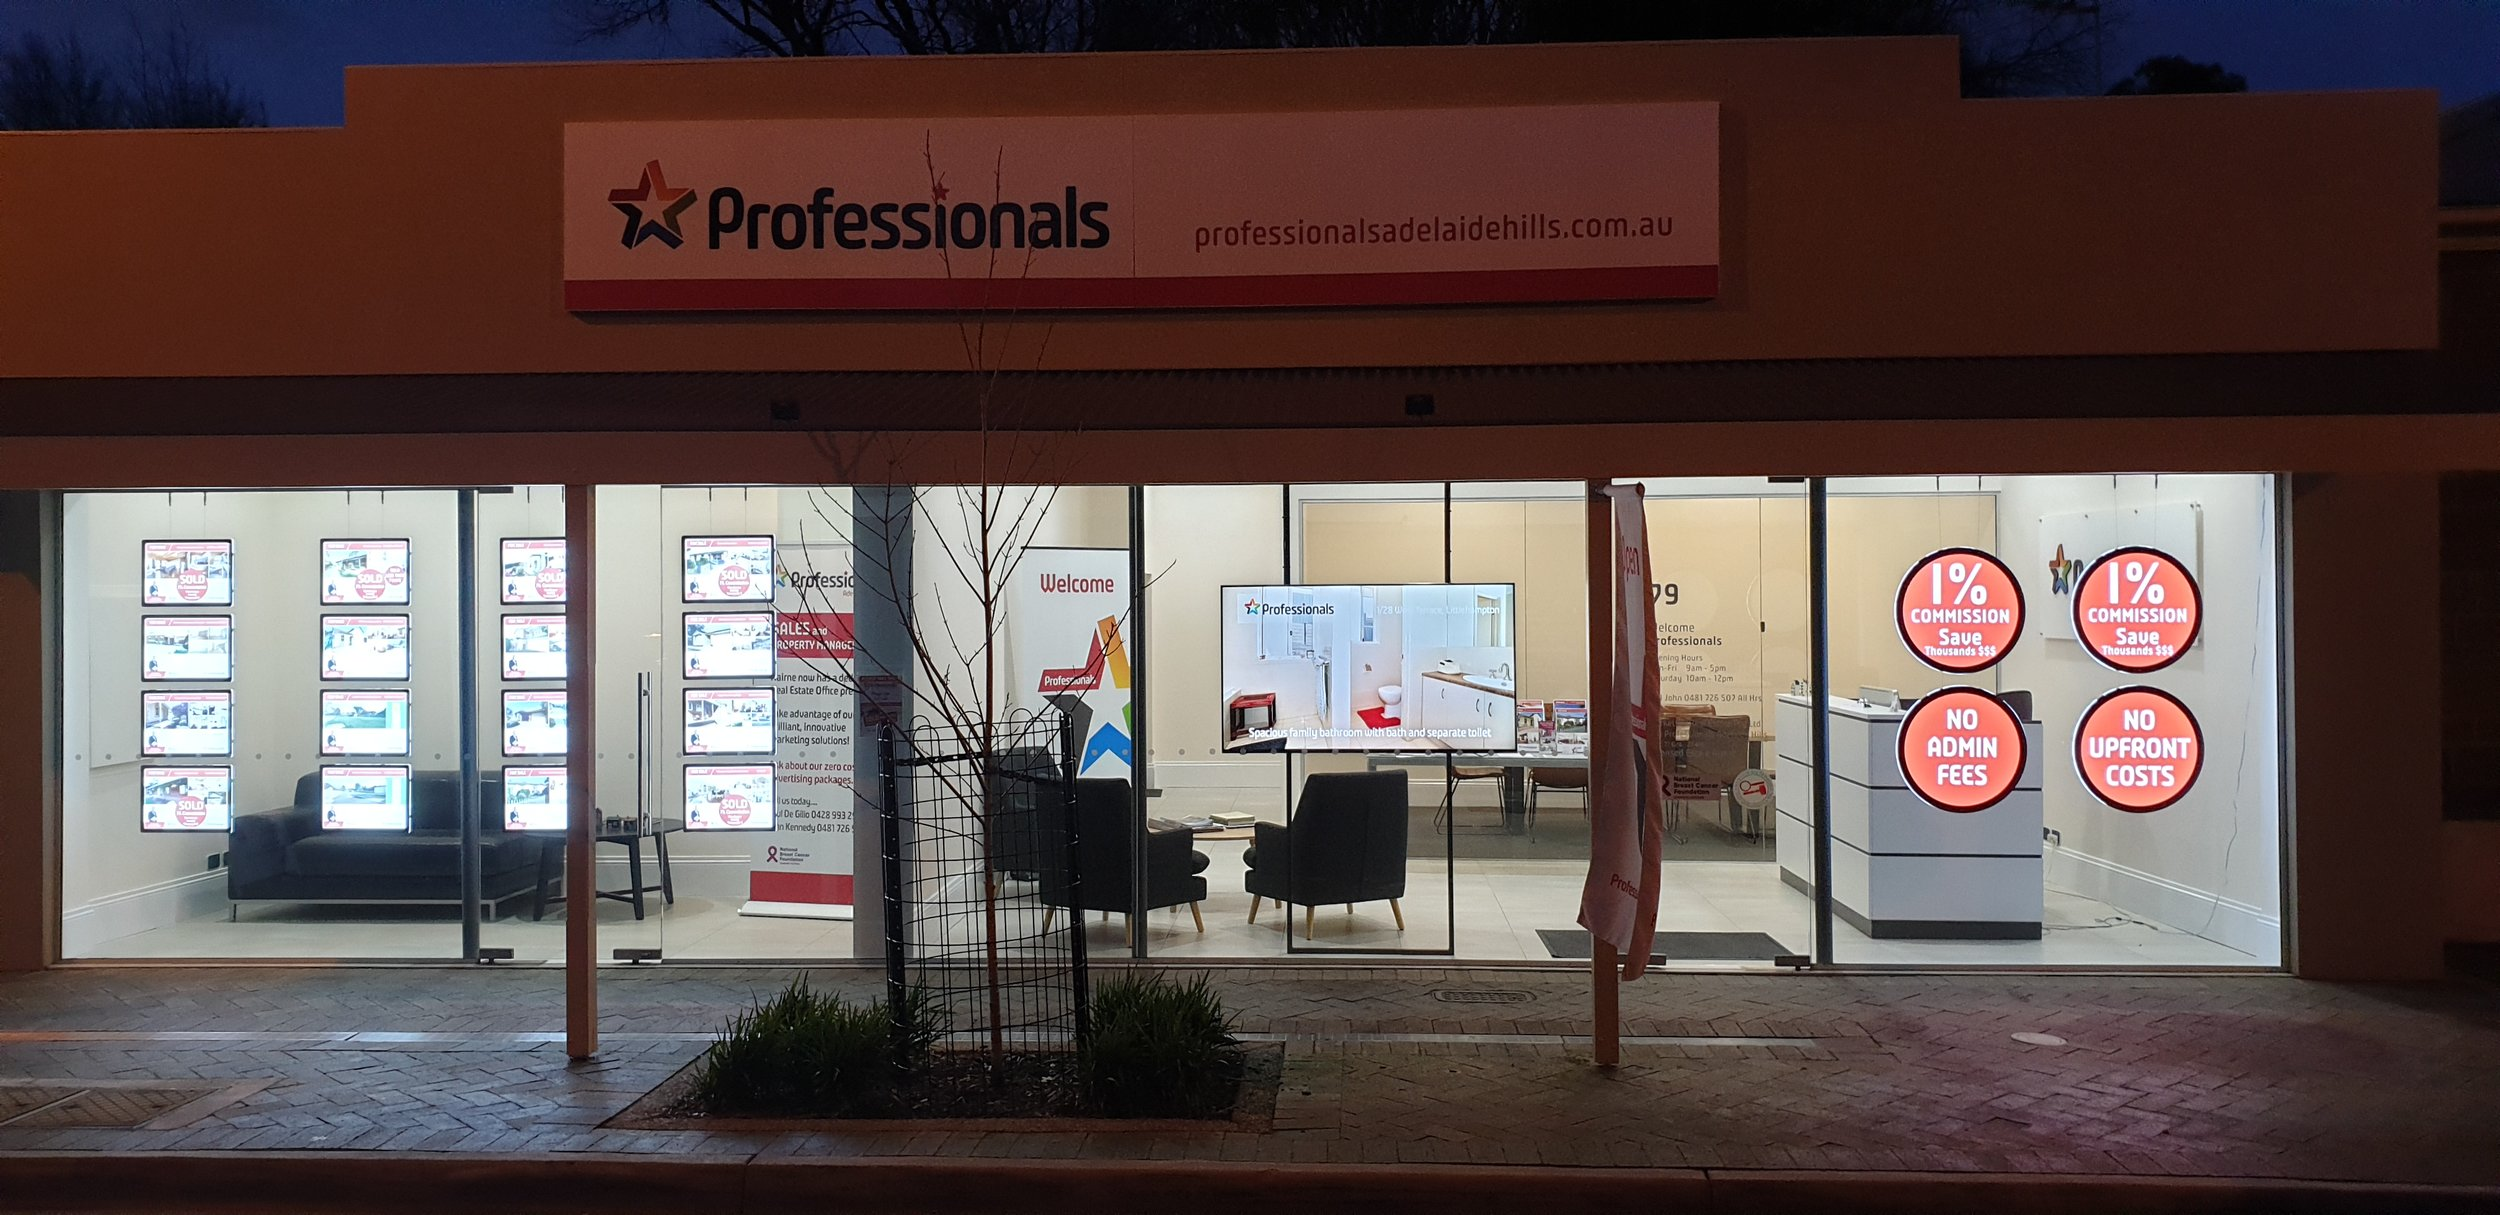 Professionals Pic.jpg